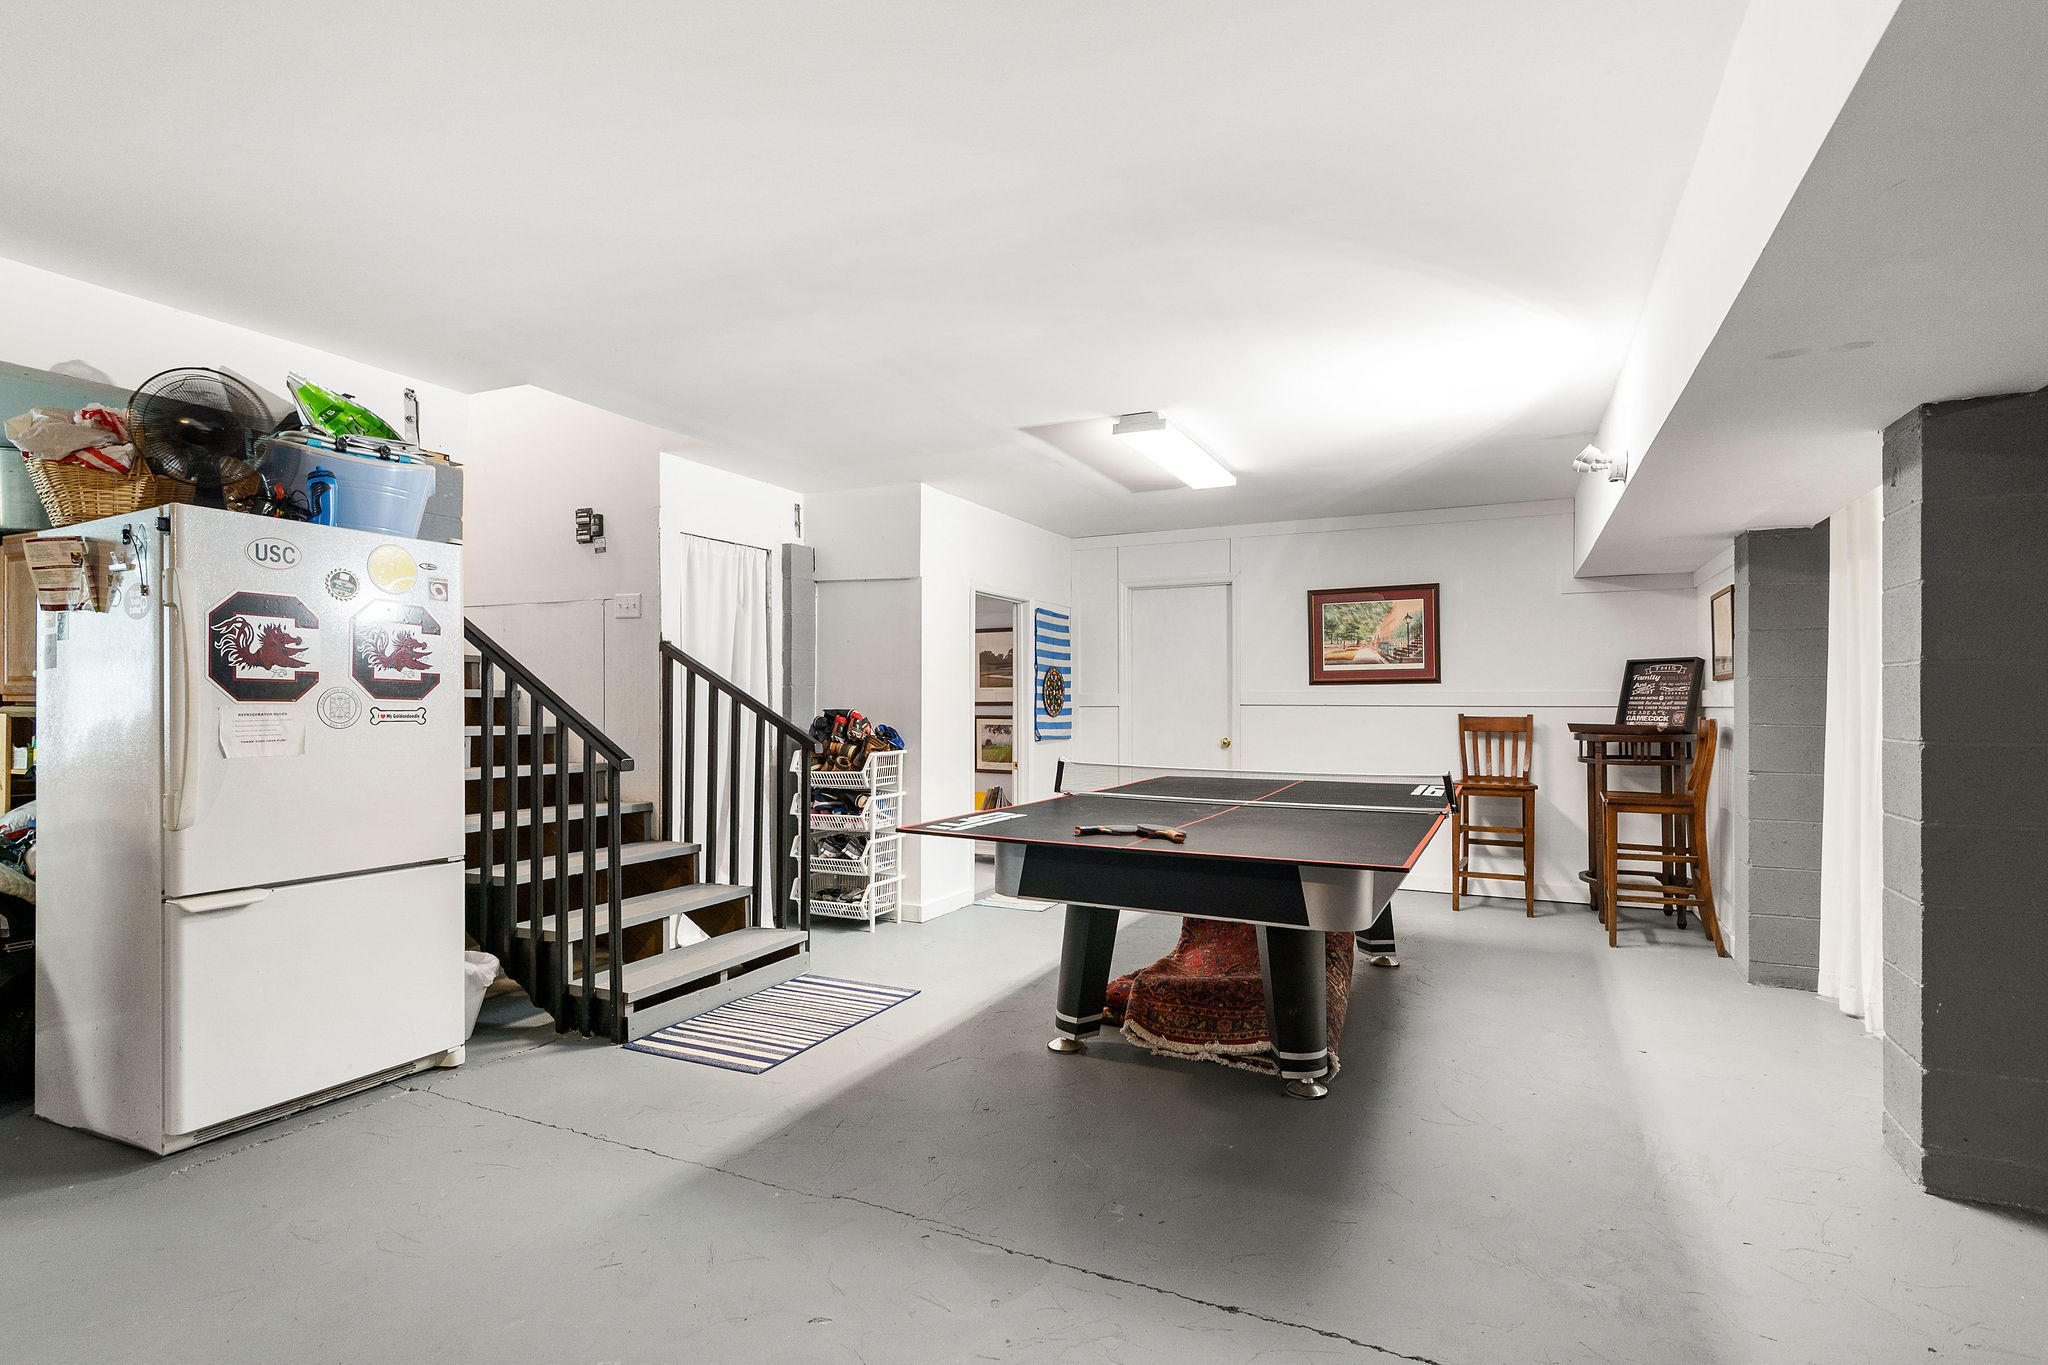 Country Club II Homes For Sale - 1482 Burningtree, Charleston, SC - 21